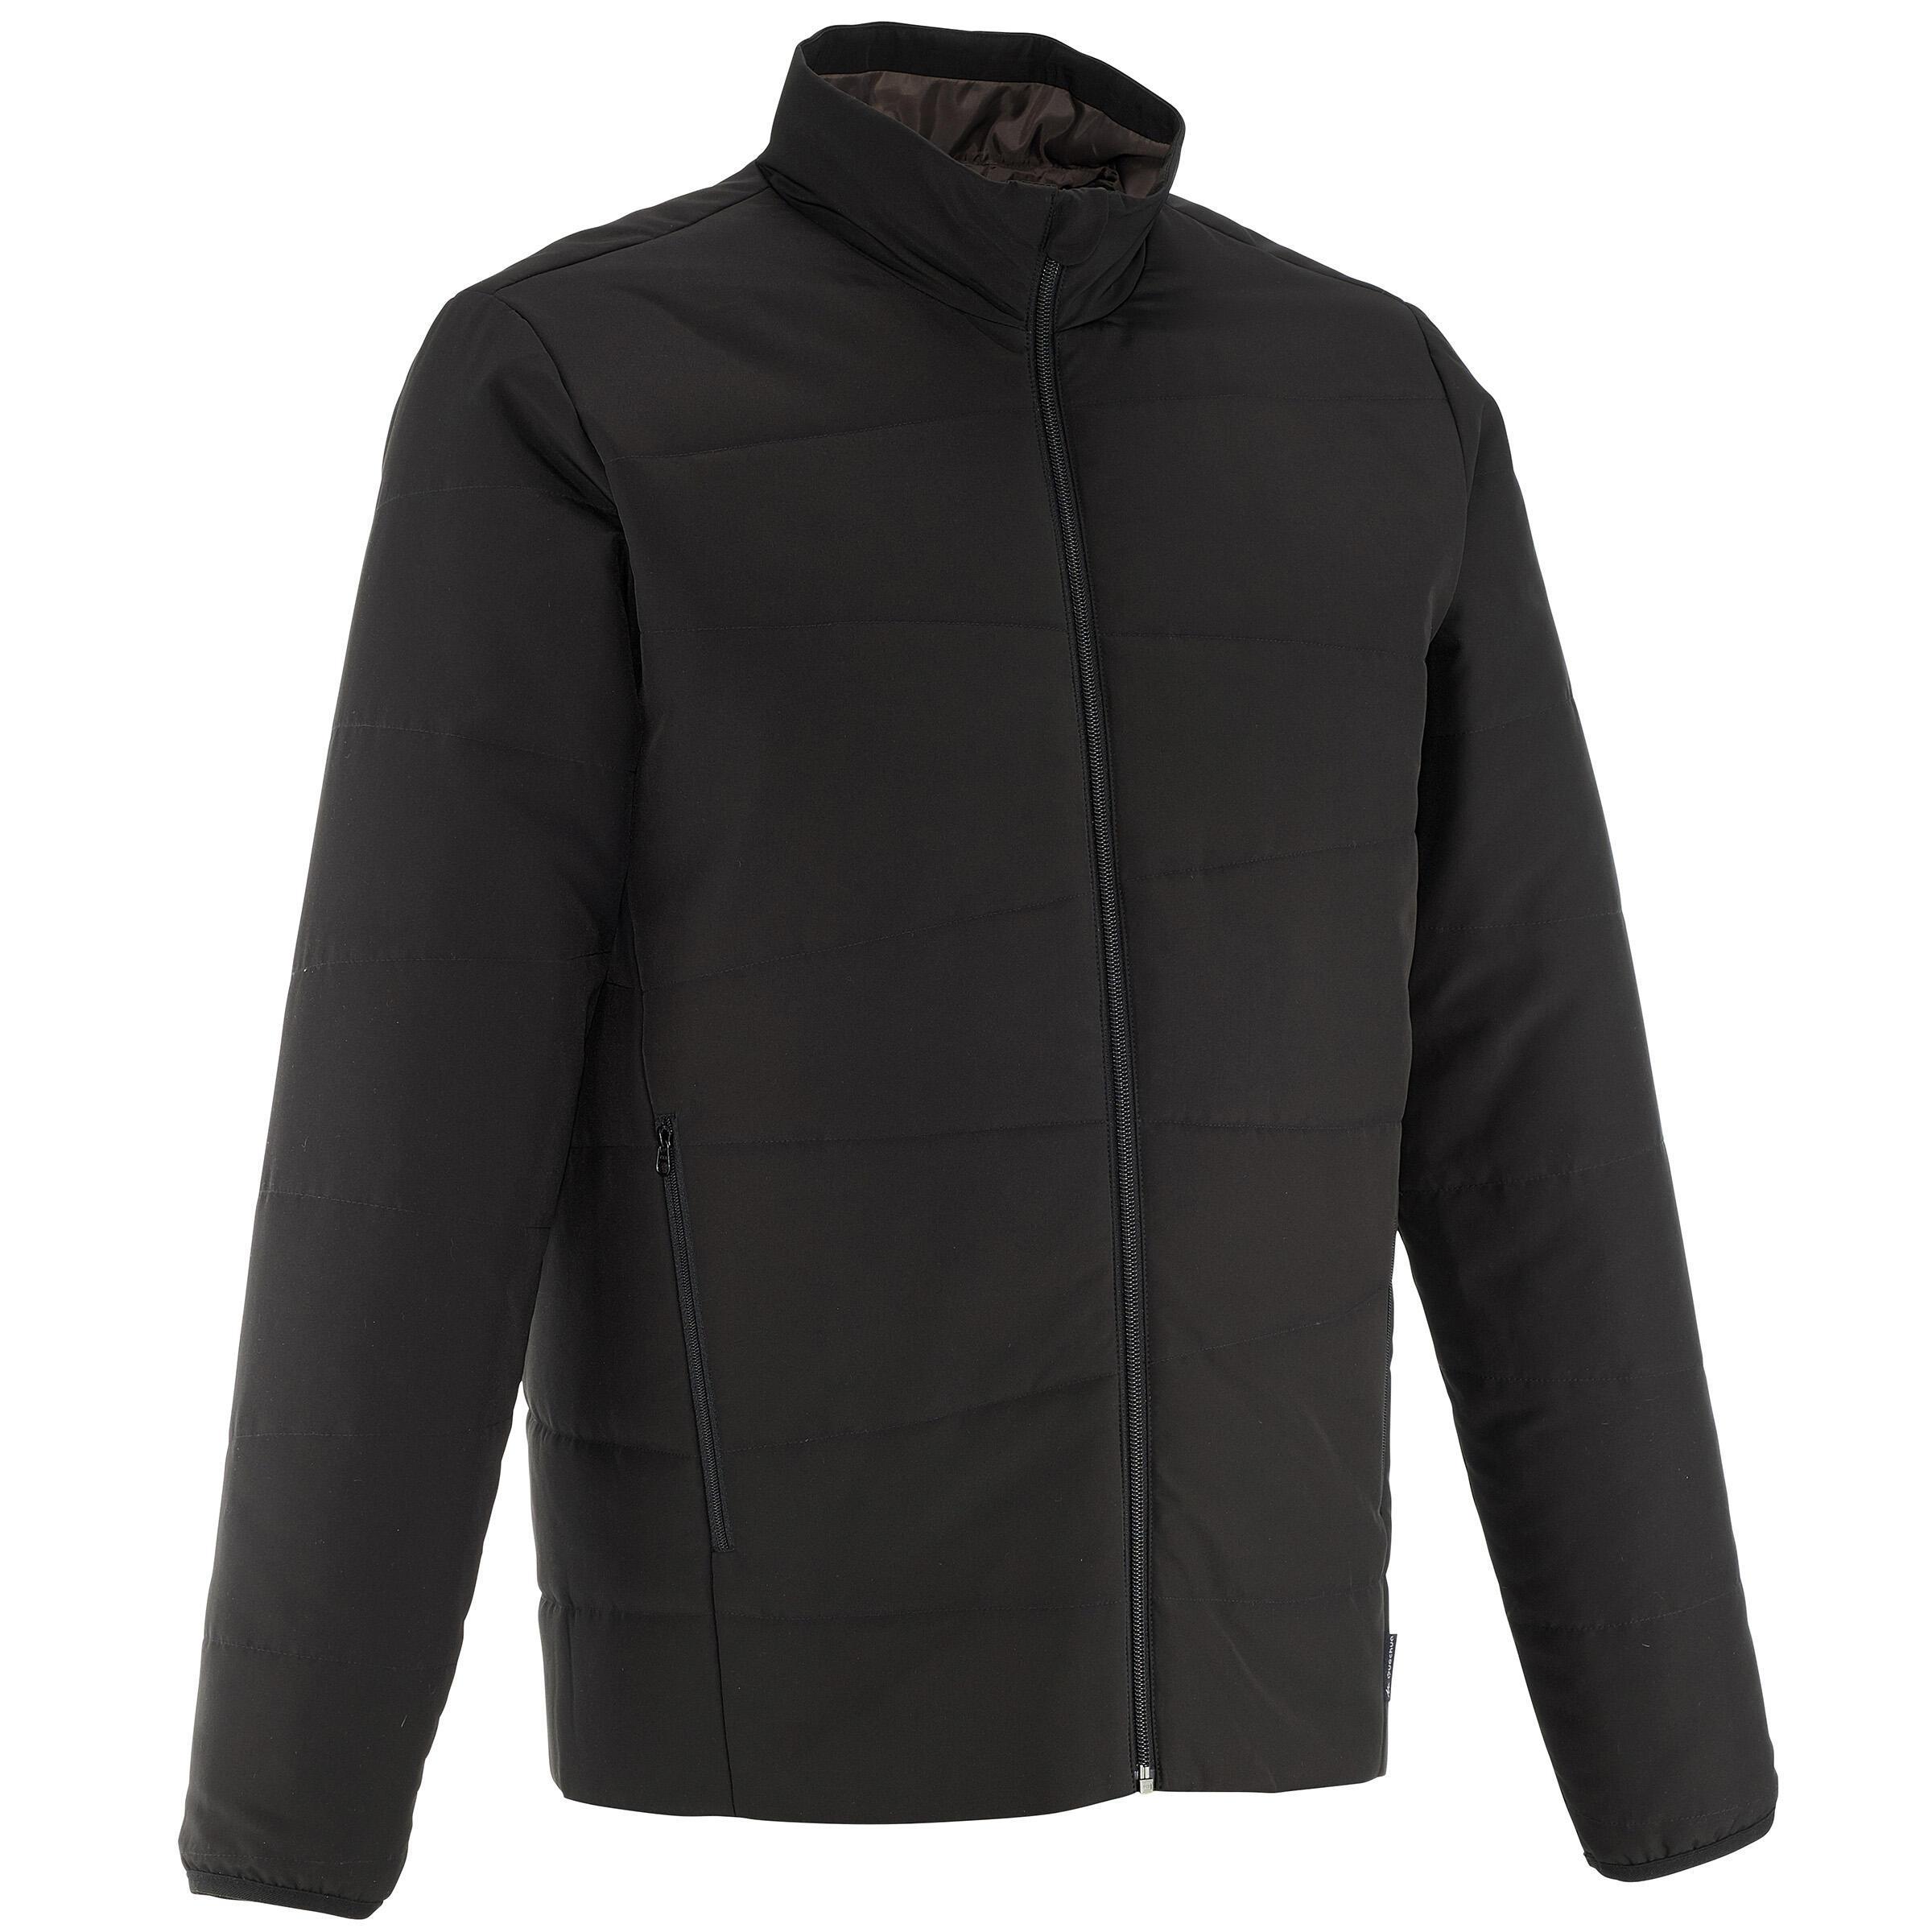 Men's Hiking Padded Jacket NH100 Black